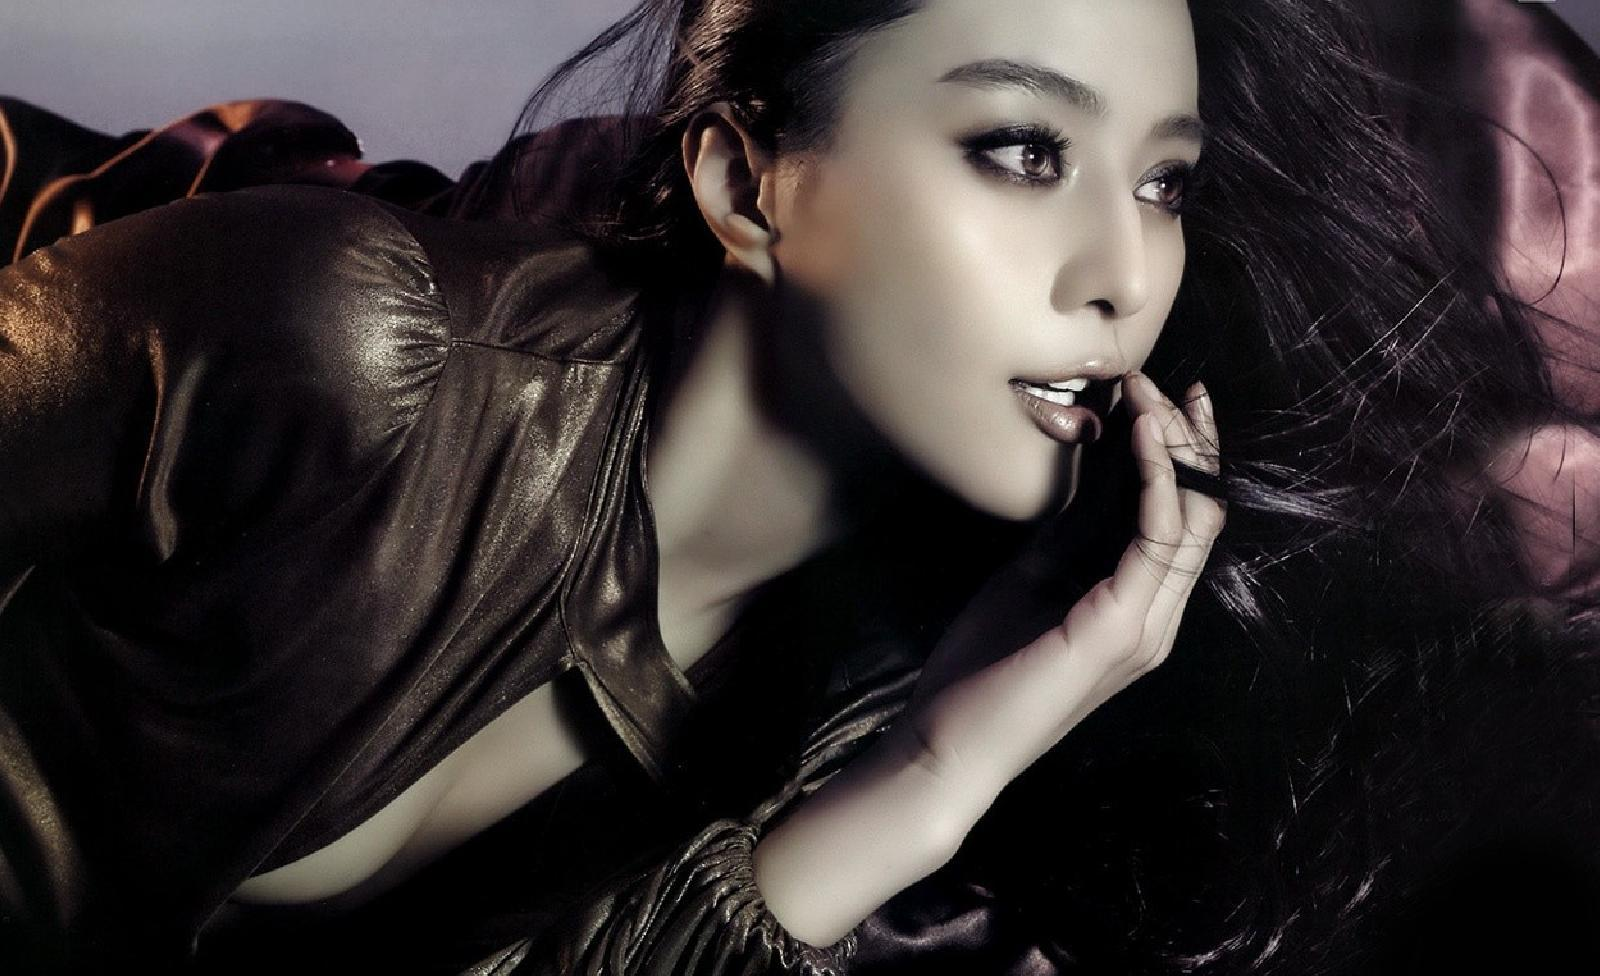 fan bingbing wallpaper and background image | 1600x976 | id:367768